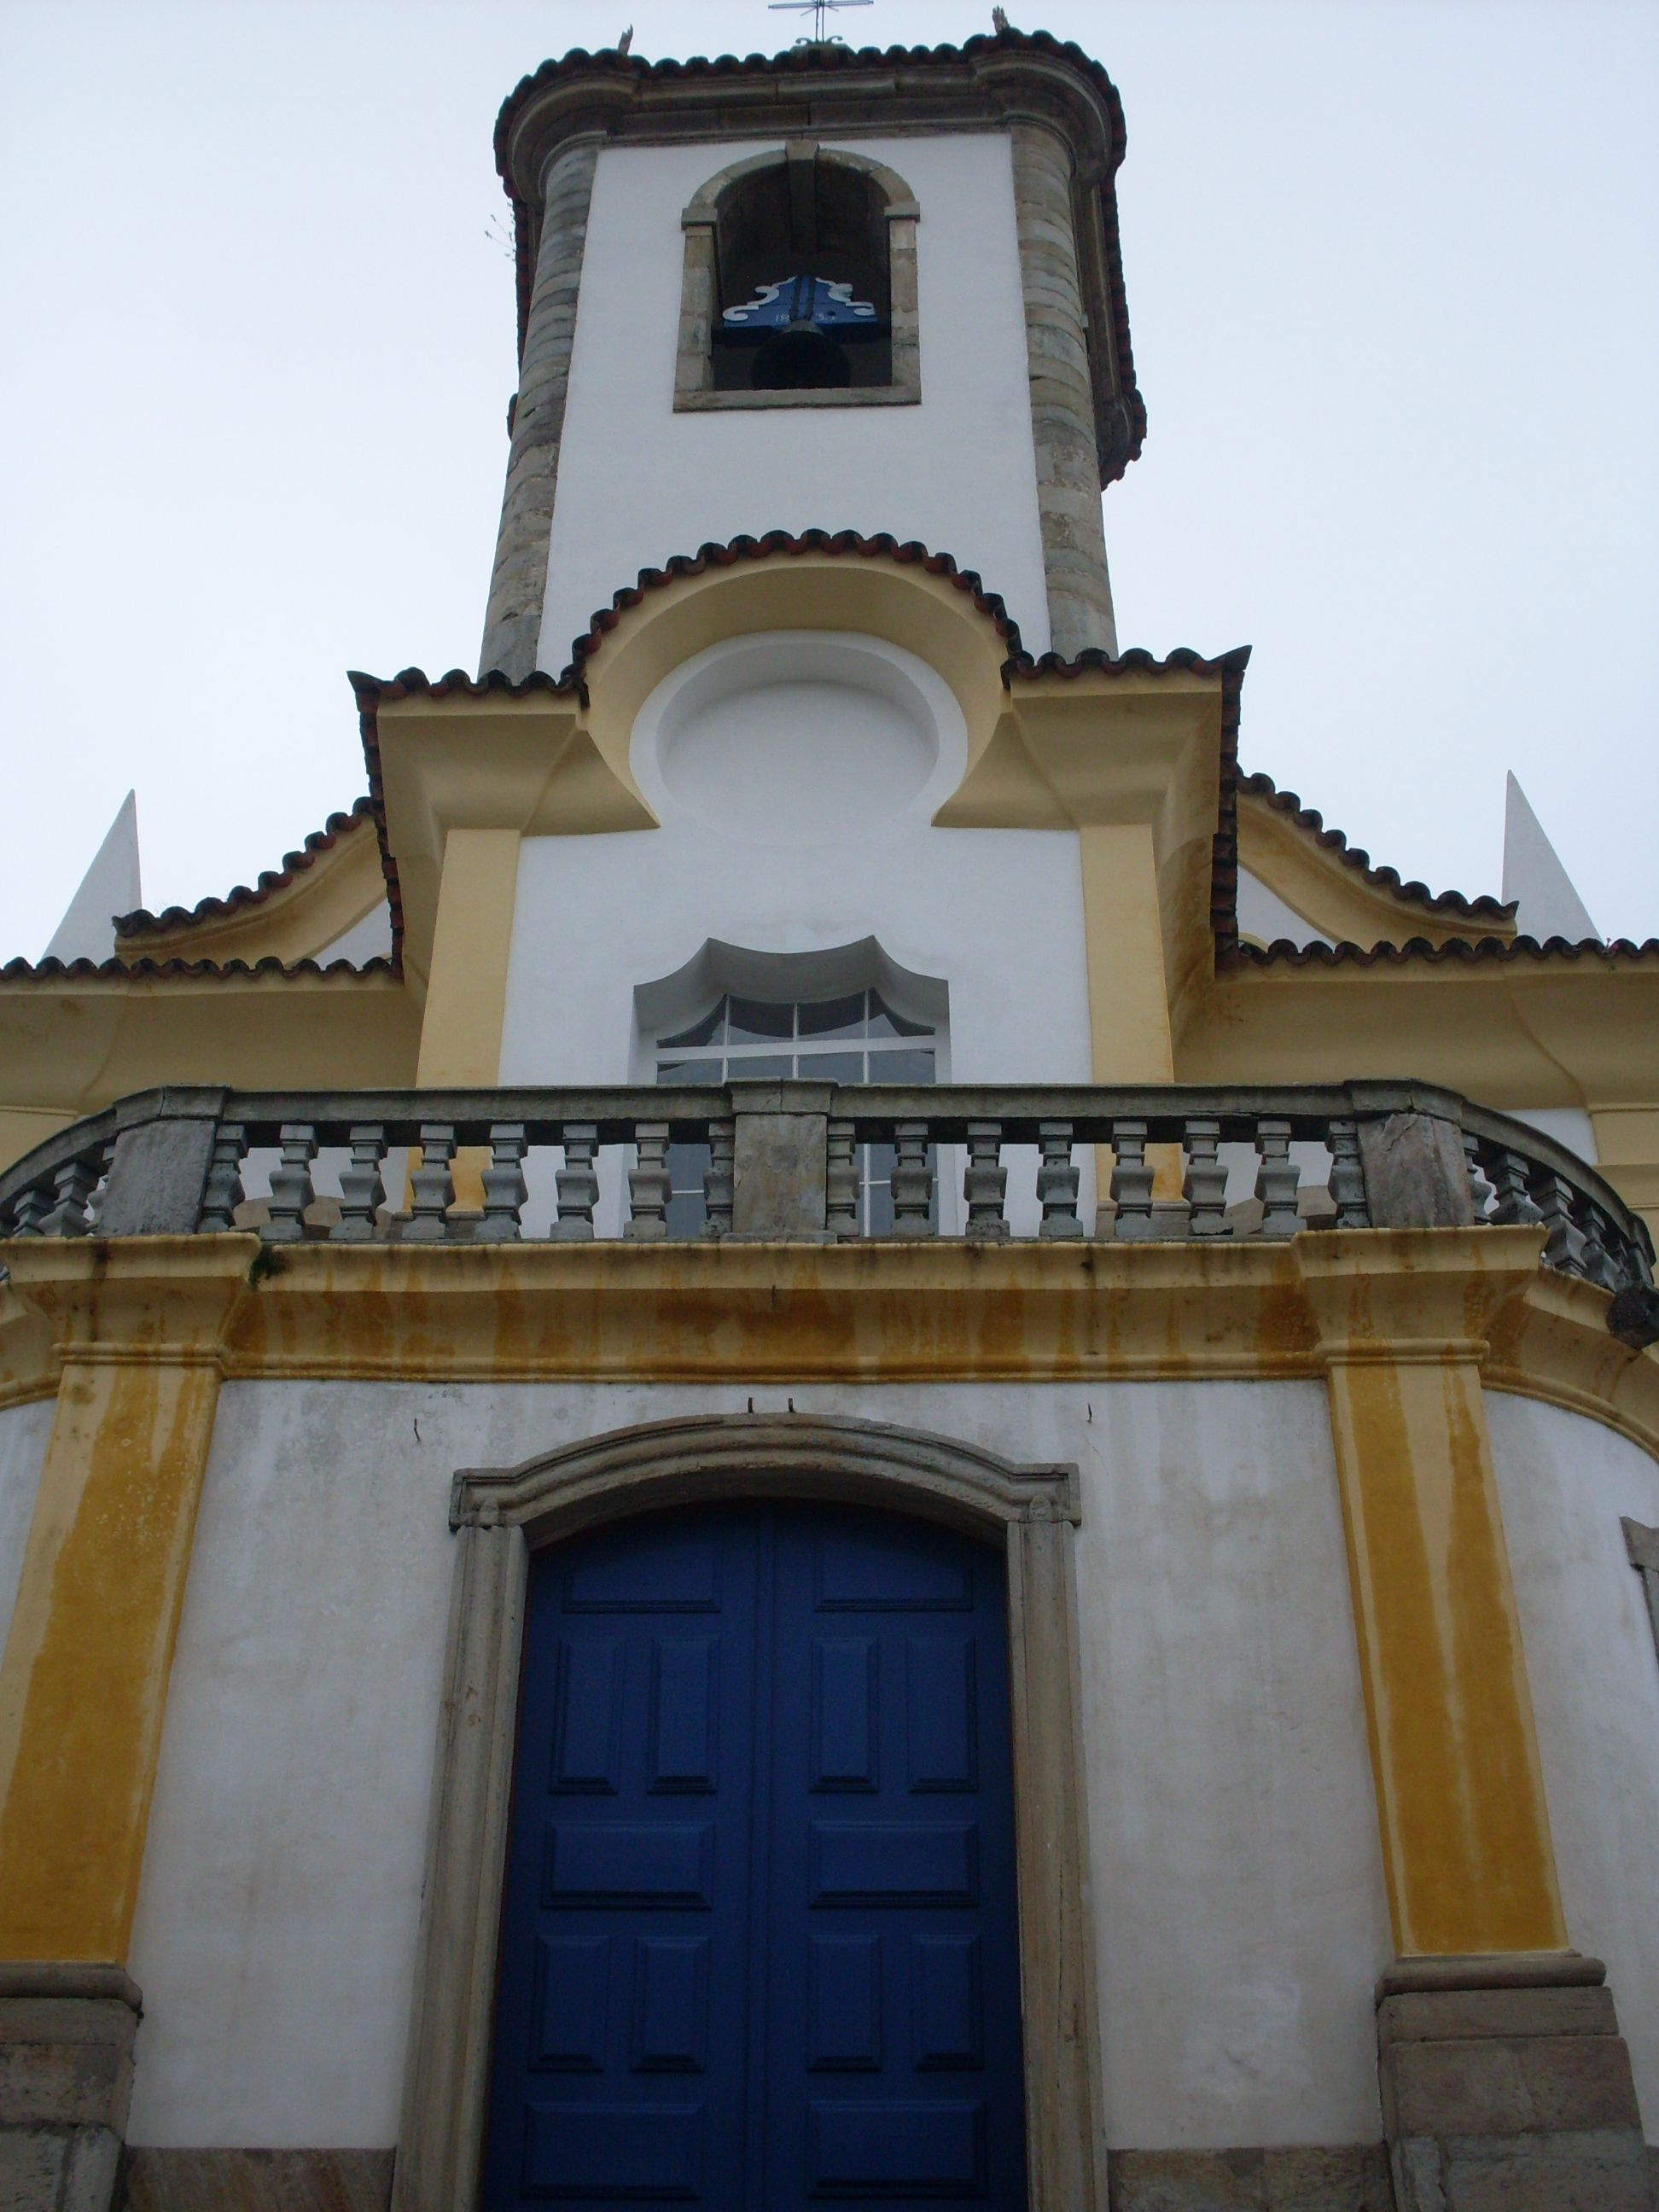 N. Sra das Mercês e Misericórdia church Ouro Preto Minas Gerais Brazil Baroque Rococo